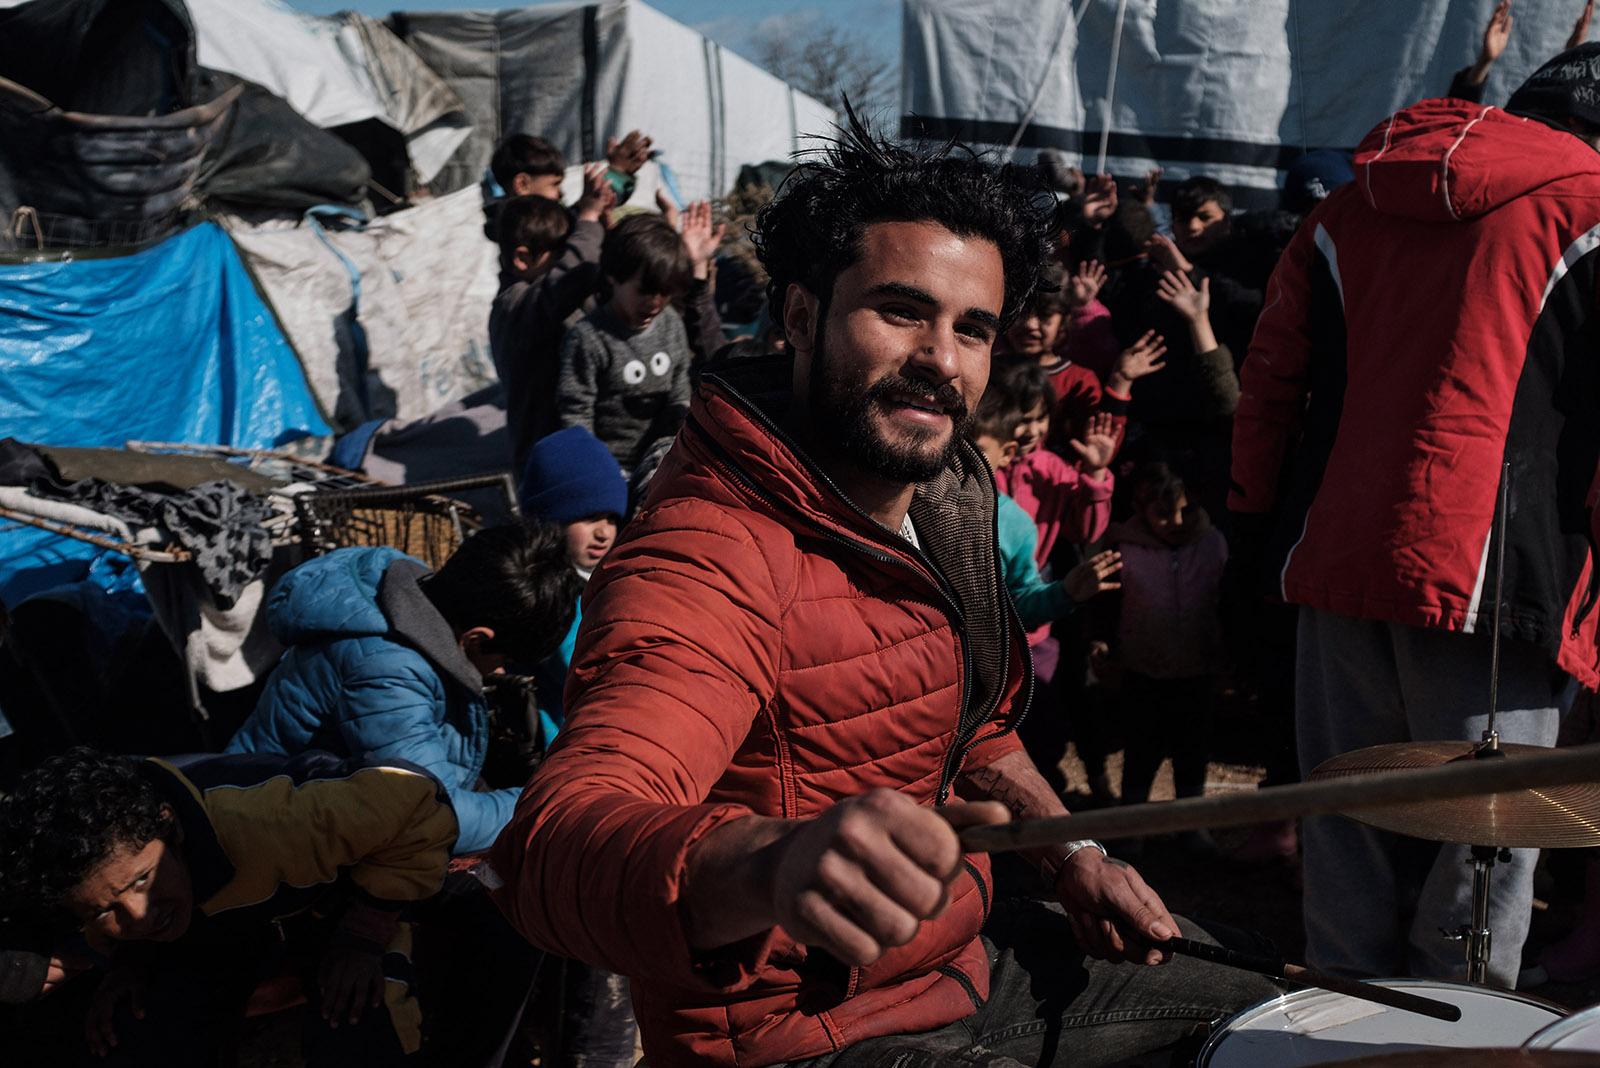 An asylum-seeker playing on a makeshift drum kit